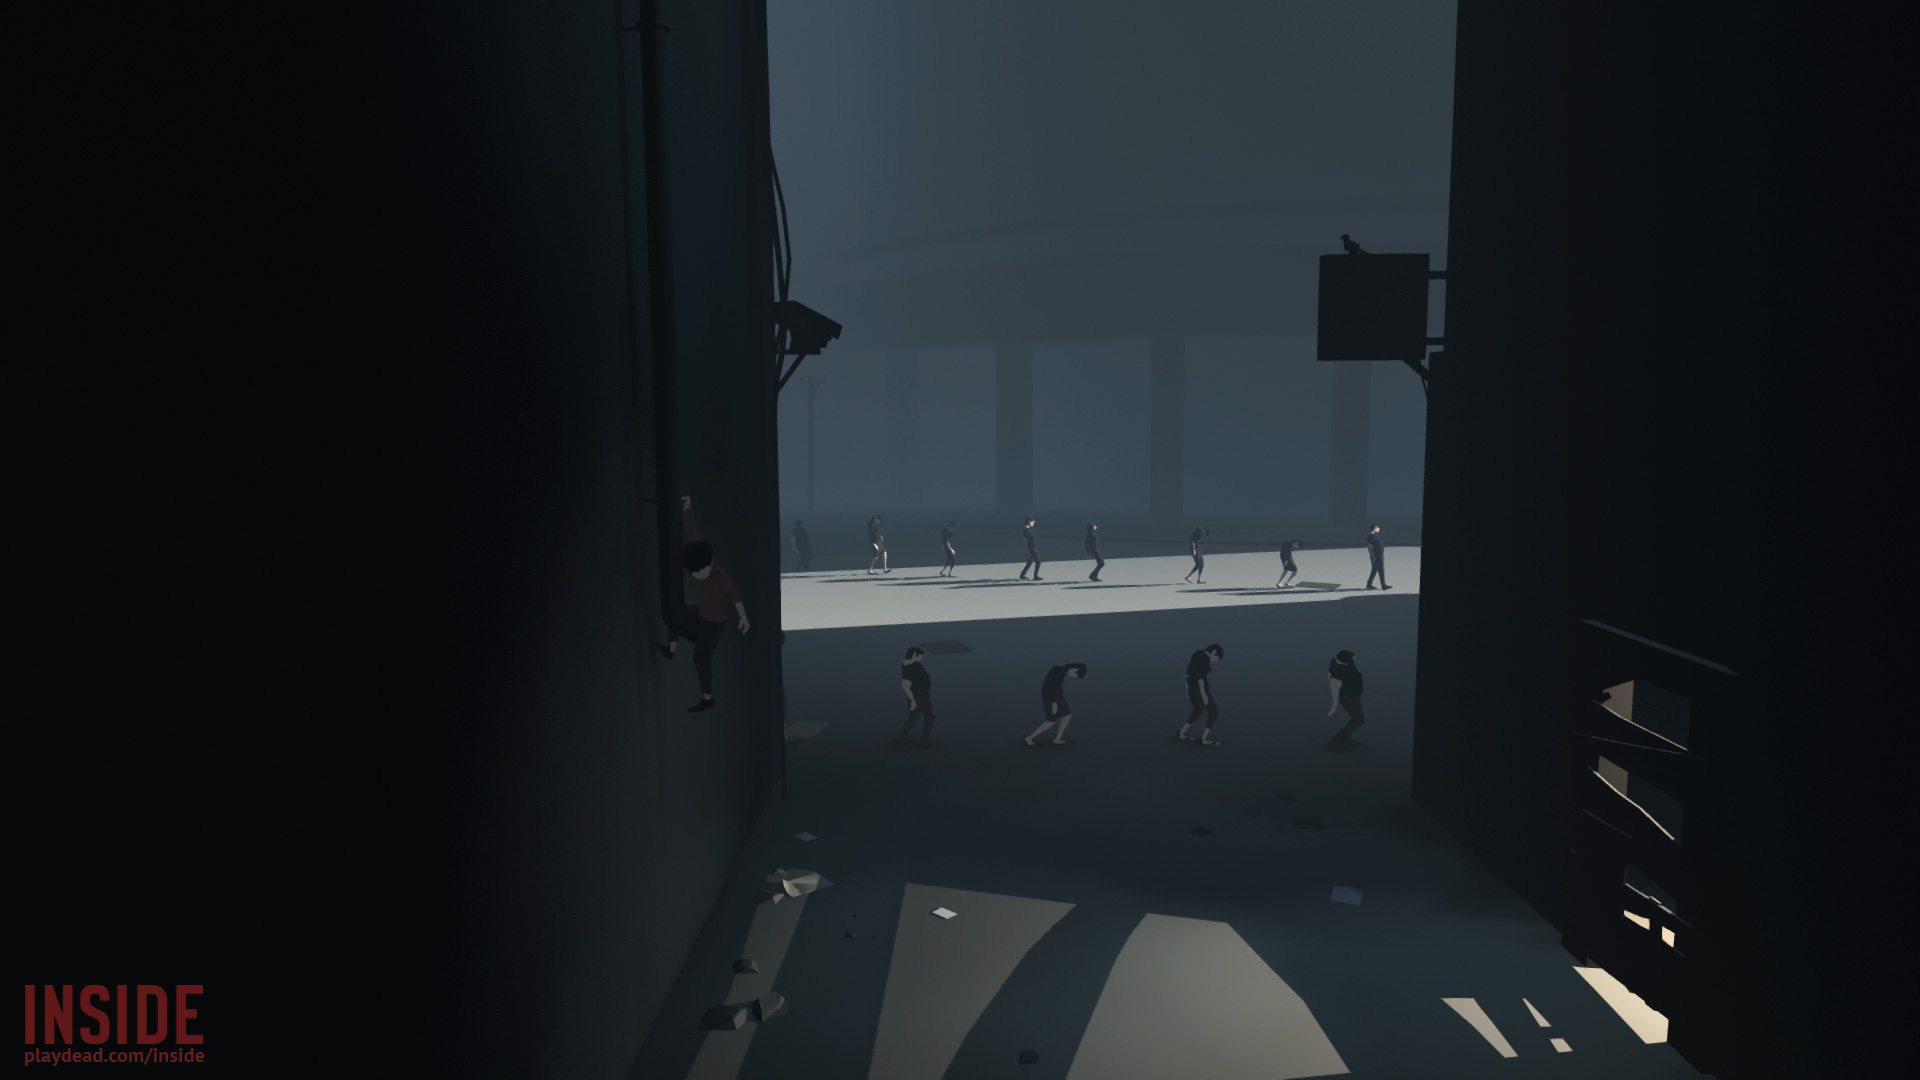 Inside-recensione-02